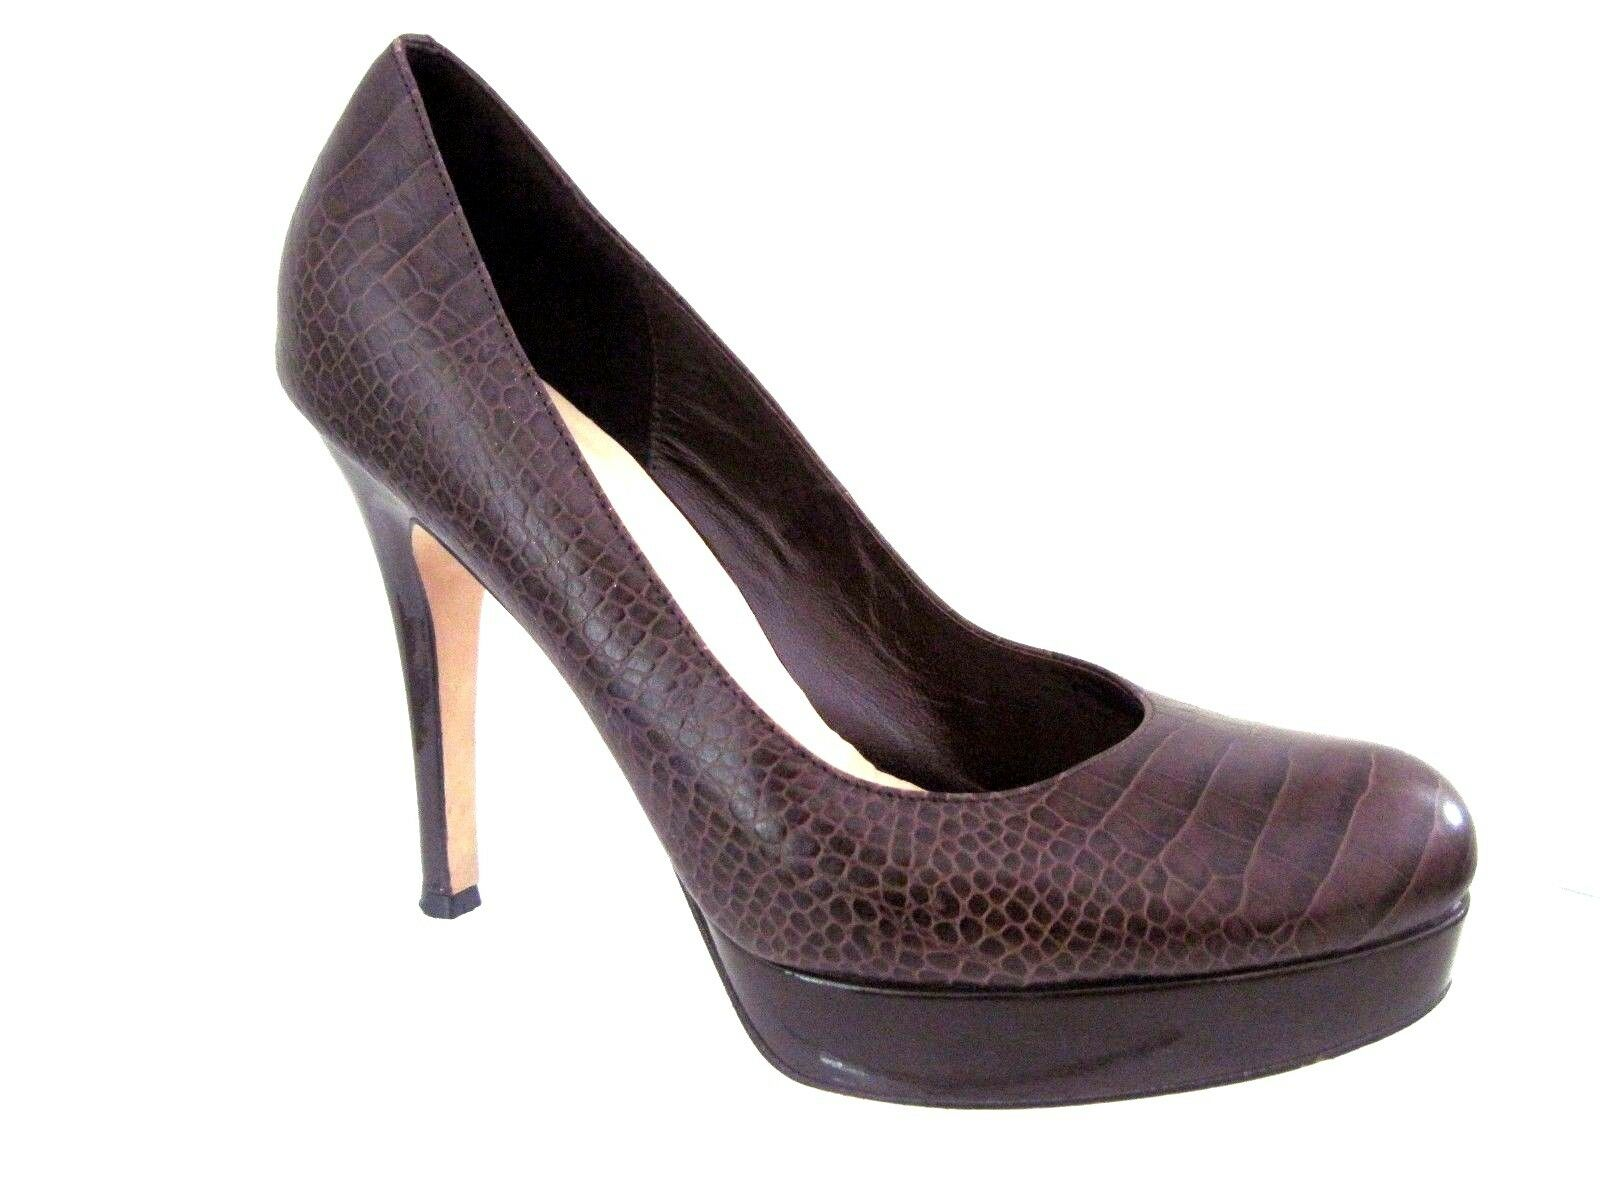 COLE HAAN Nike Air Chestnut Croc Print Leather MARIELA Platform Pump Pump Platform Size 9 1/2 b5dde1